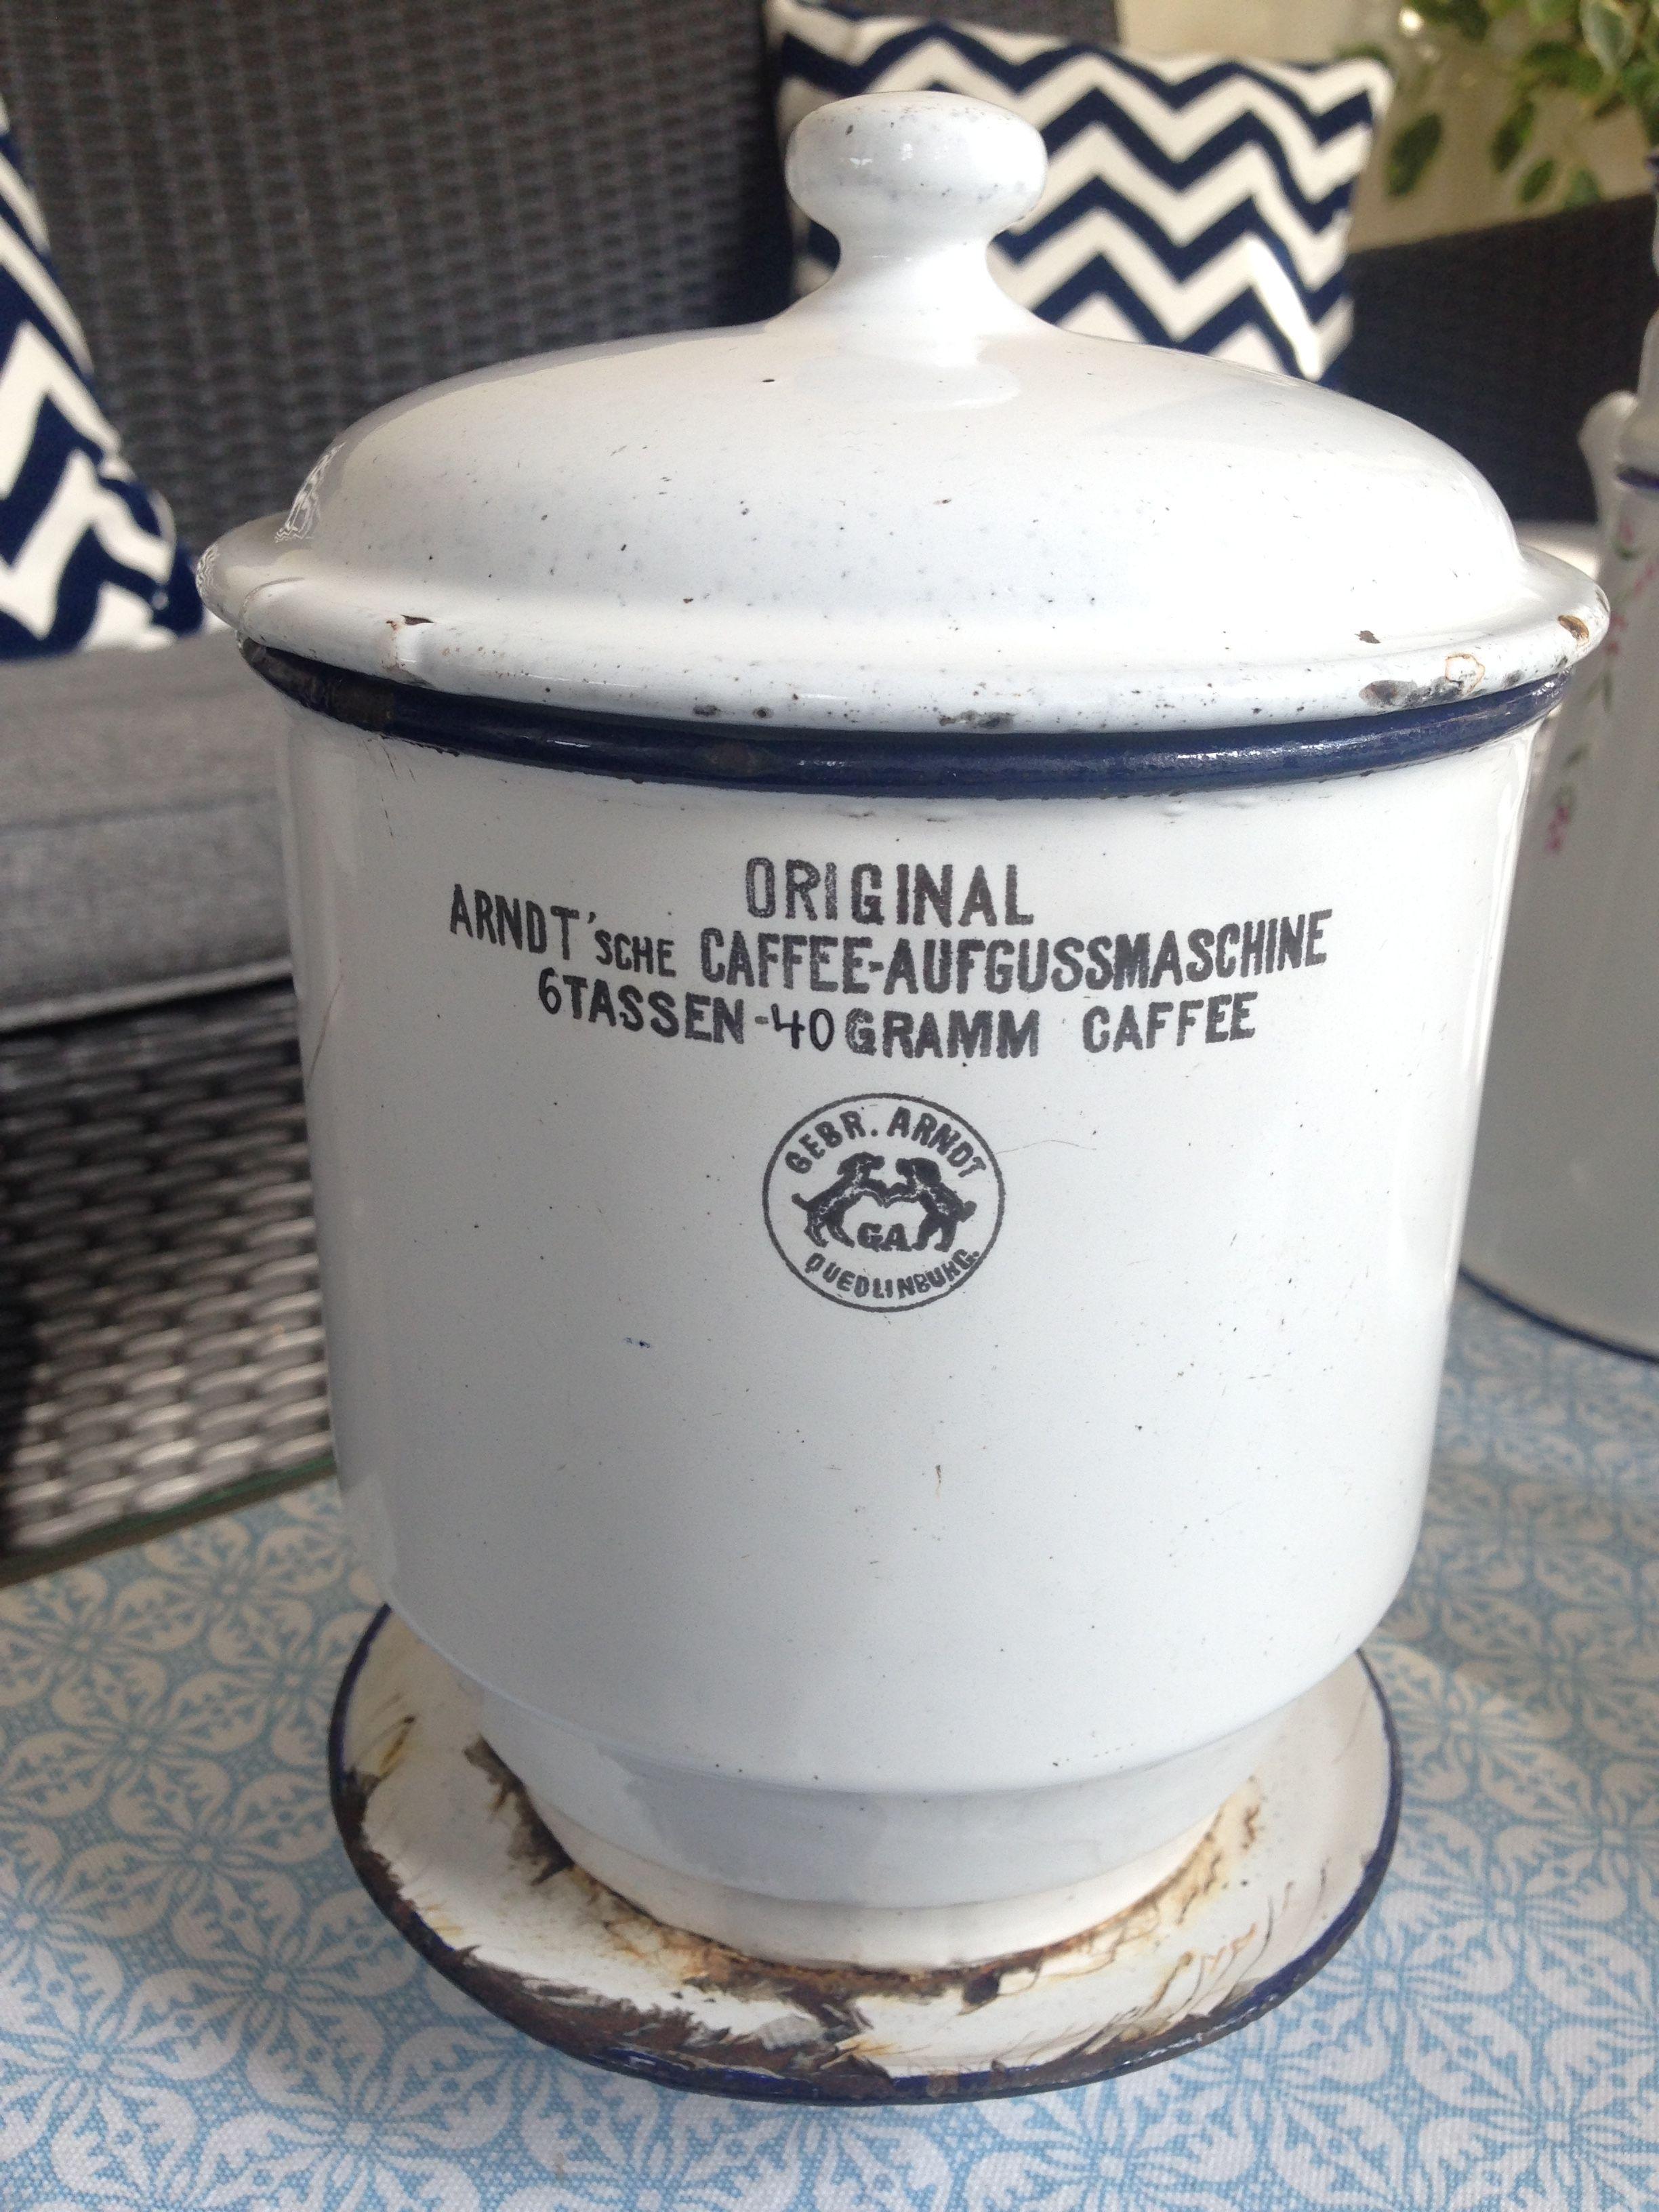 vintage coffeemaker original arndt 39 sche kaffeemaschine made in germany e steiner collection. Black Bedroom Furniture Sets. Home Design Ideas